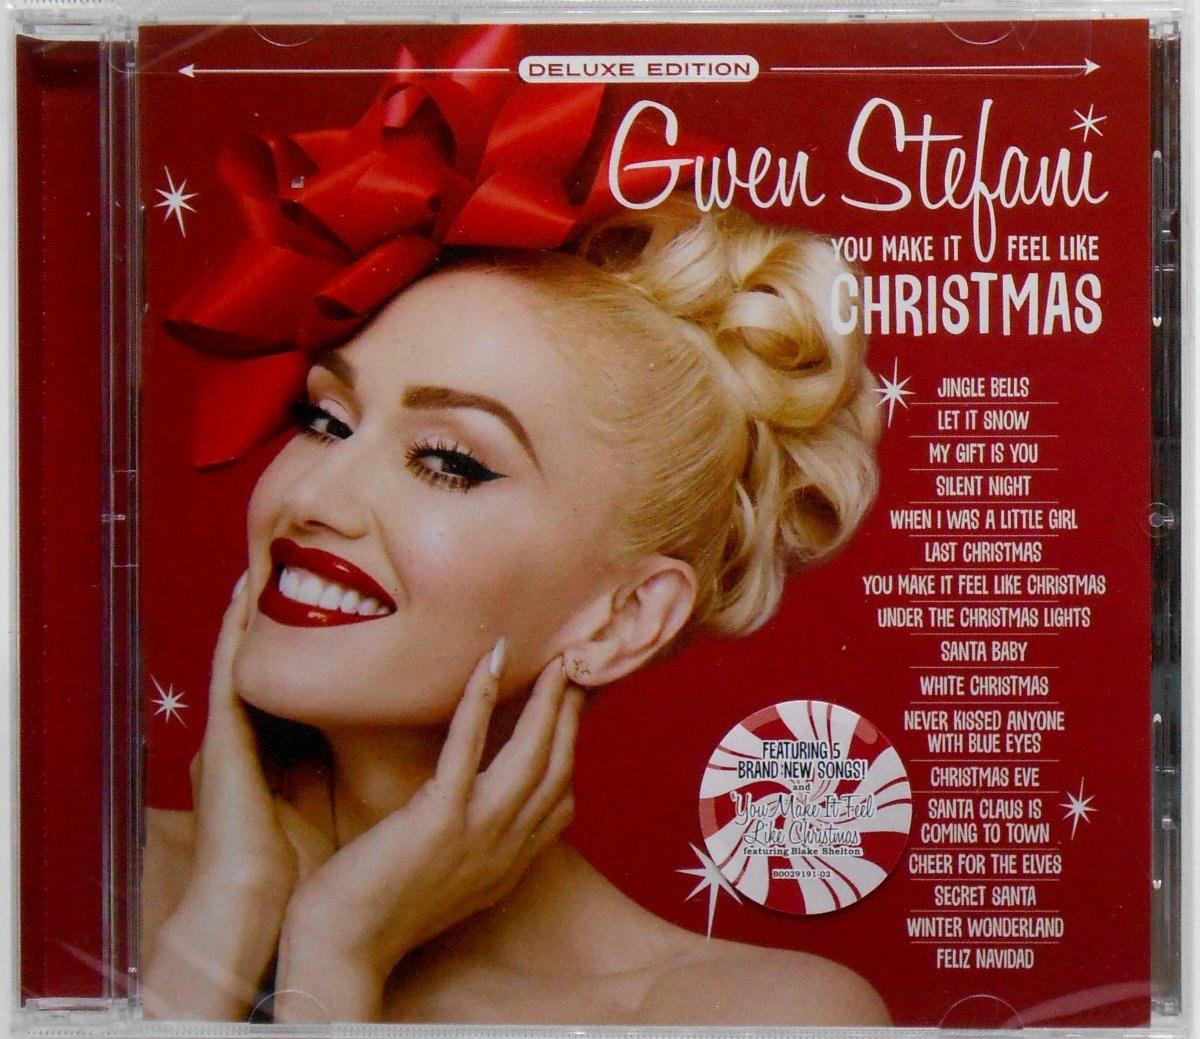 Gwen Stefani Christmas Cd.Cd Gwen Stefani You Make It Feel Like Christmas 2018 Deluxe